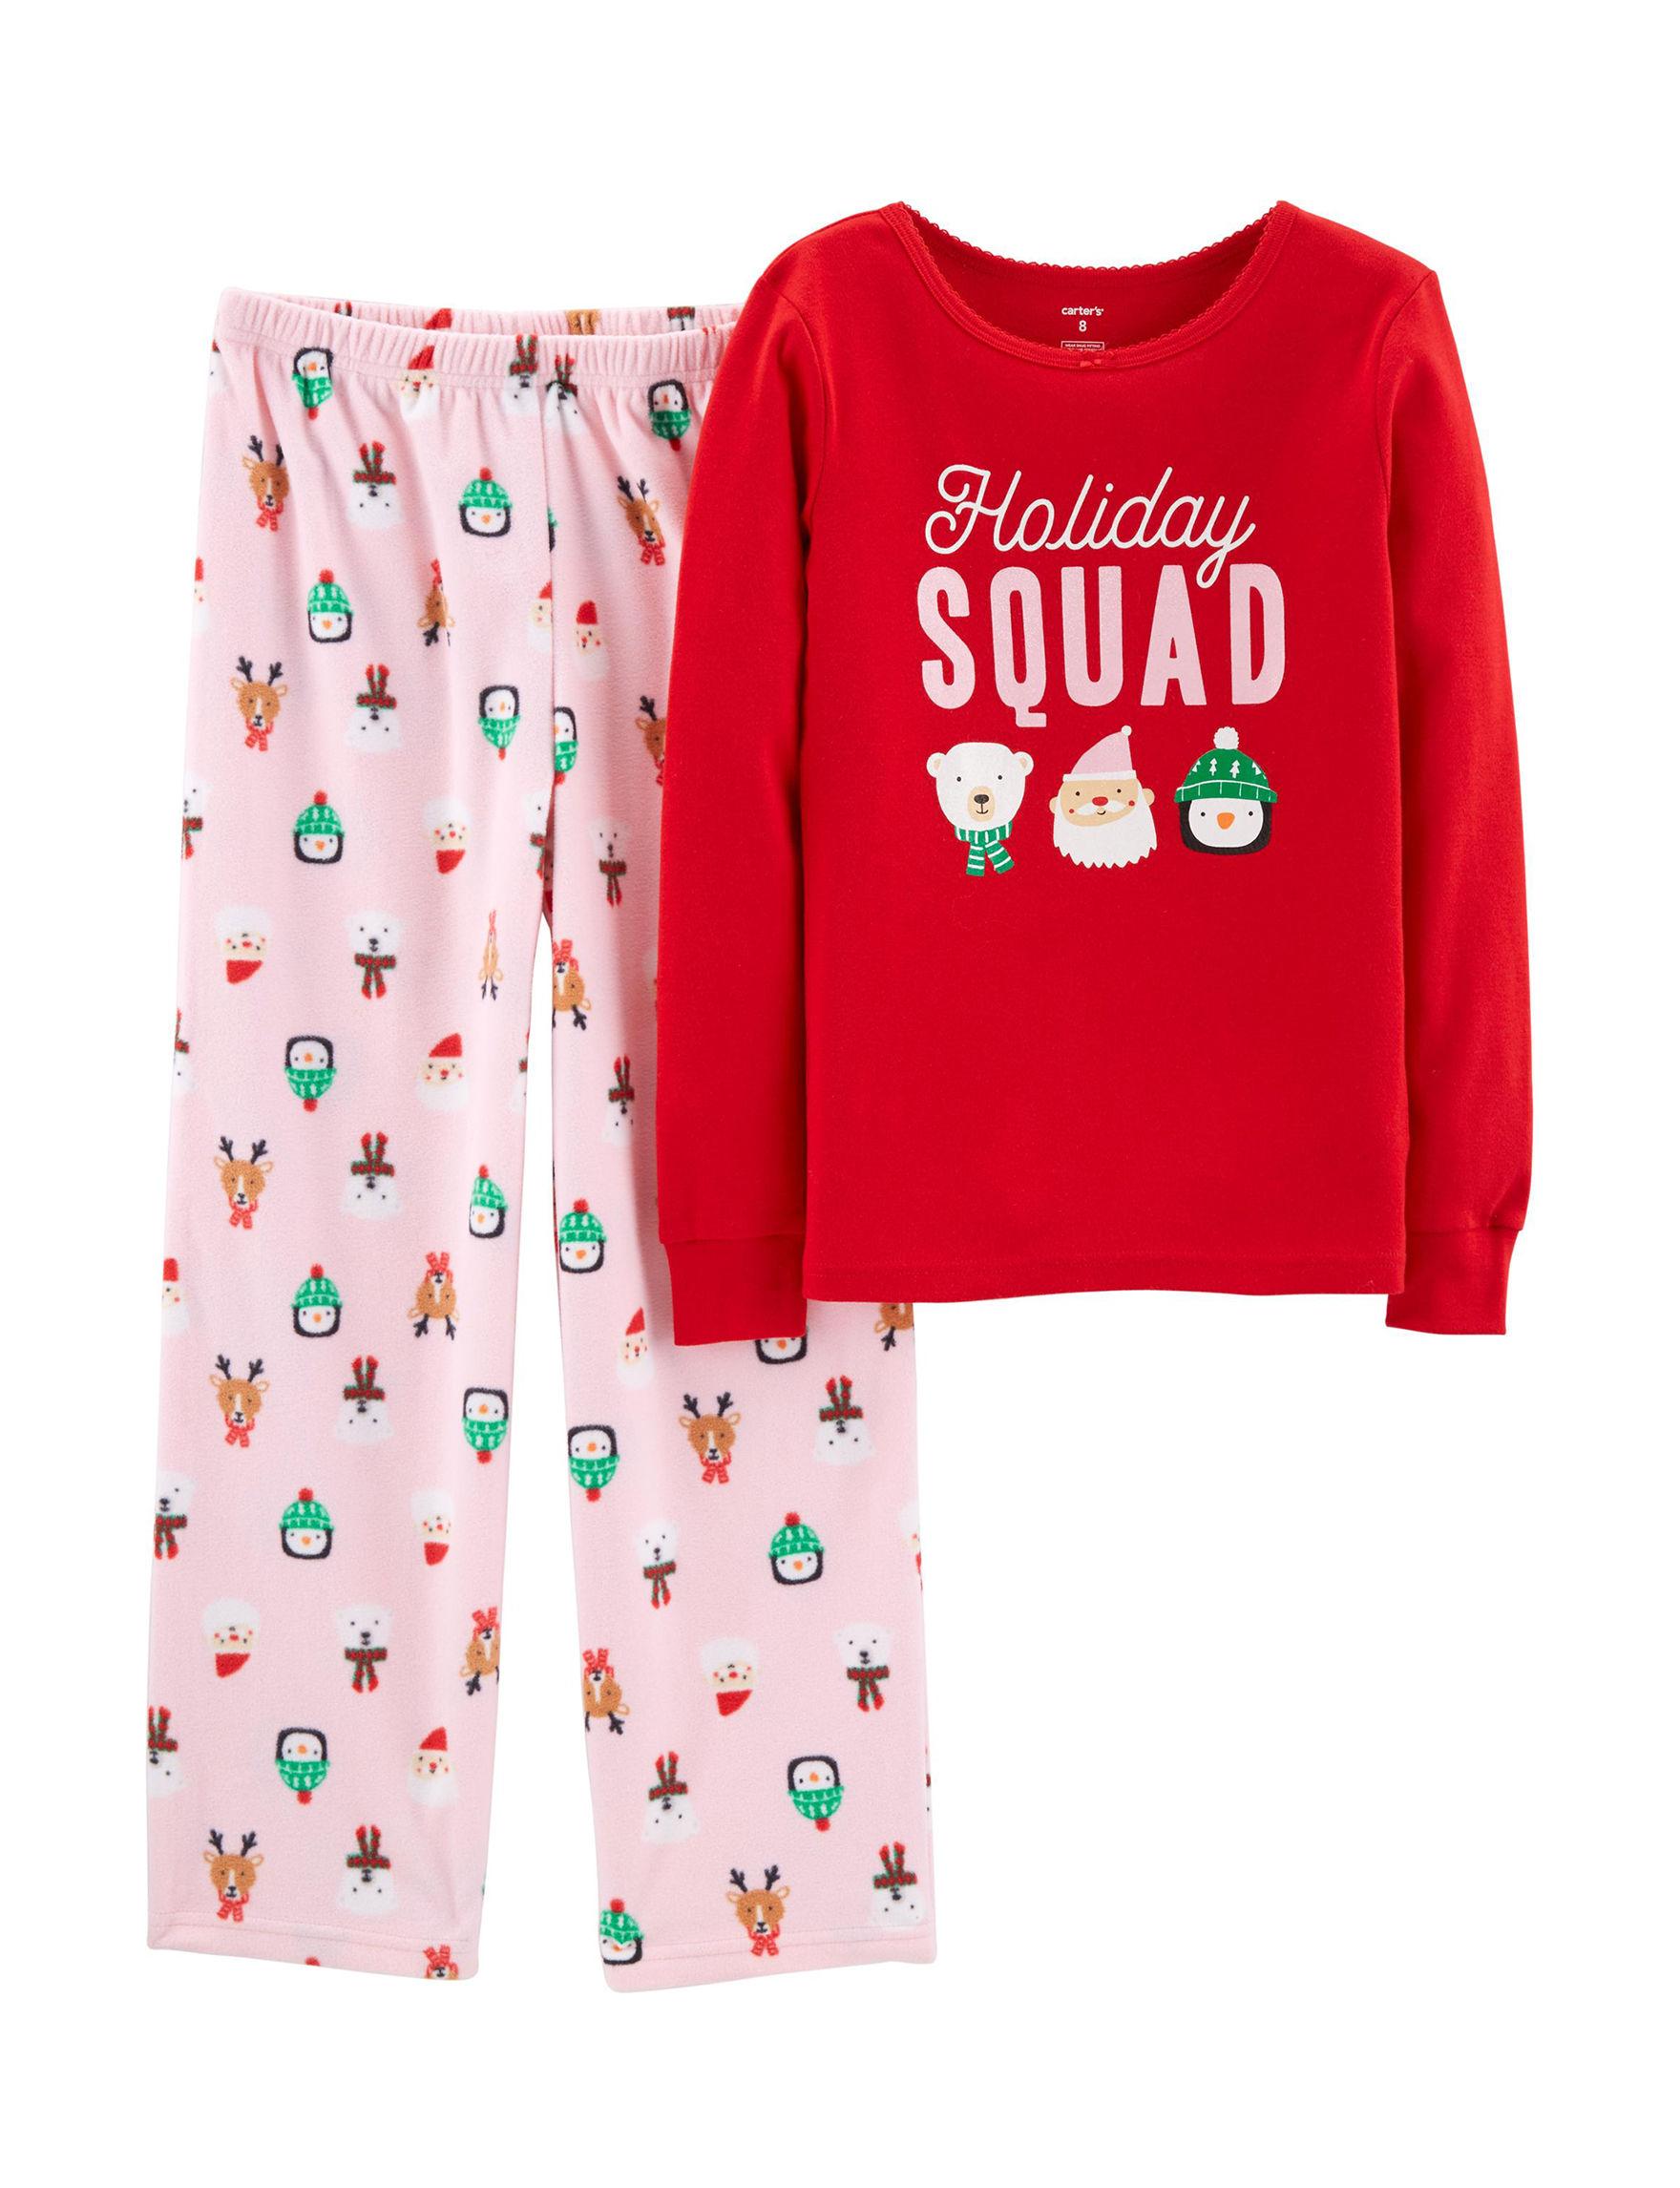 Carter's Pink / Red Pajama Sets